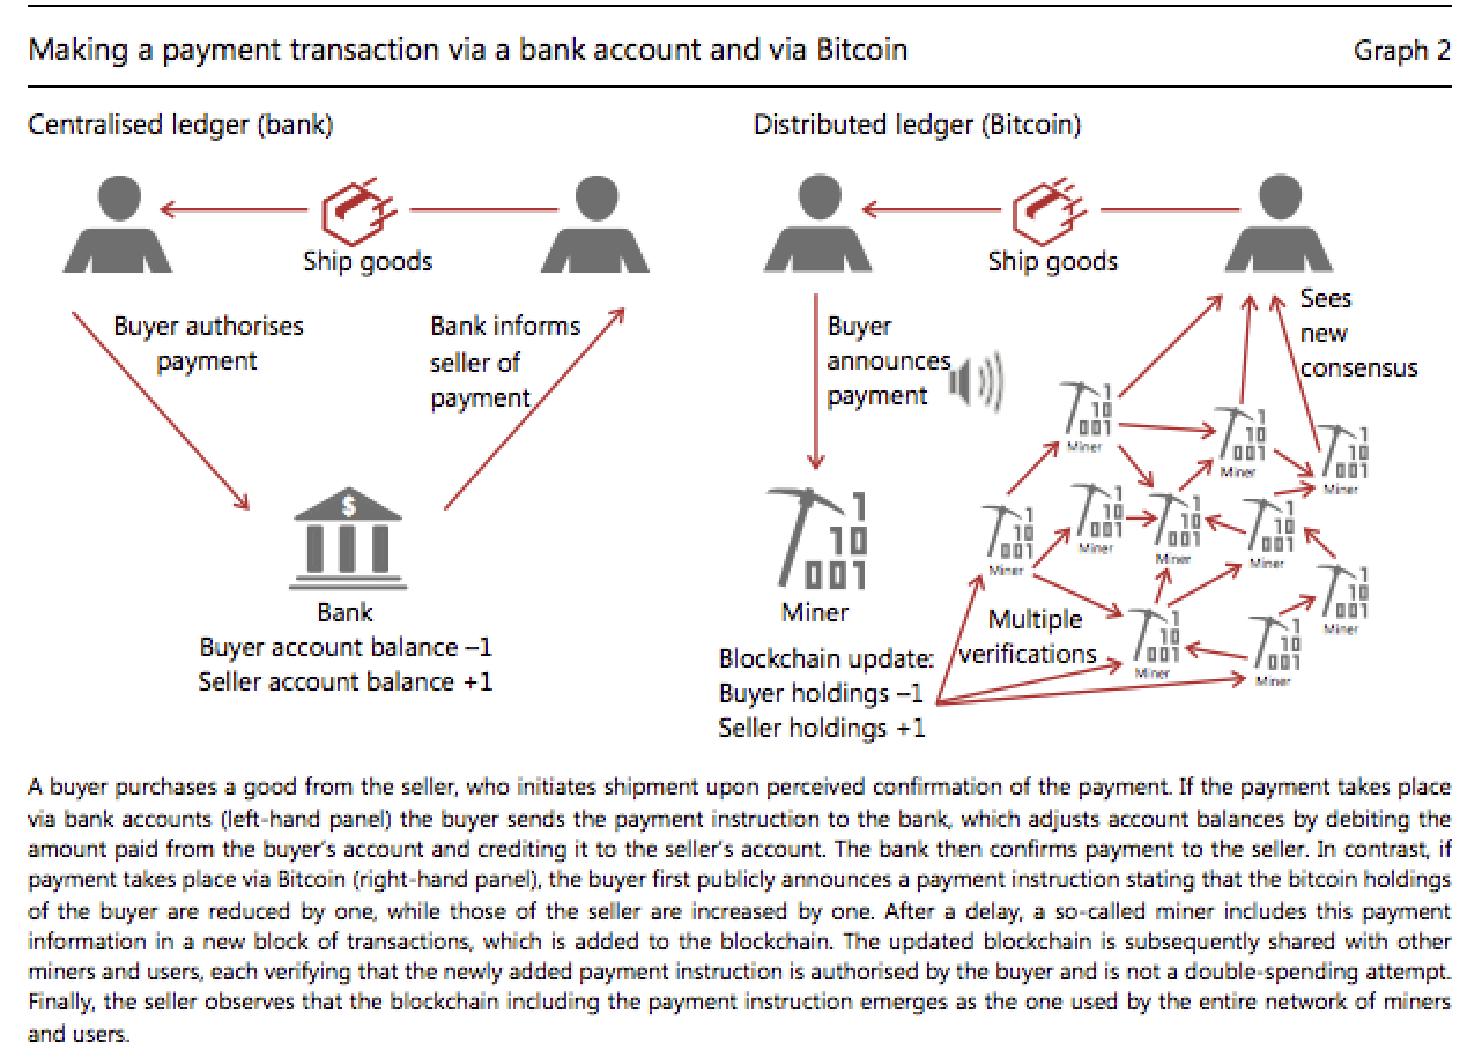 DSHR's Blog: The Economics Of Bitcoin Transactions